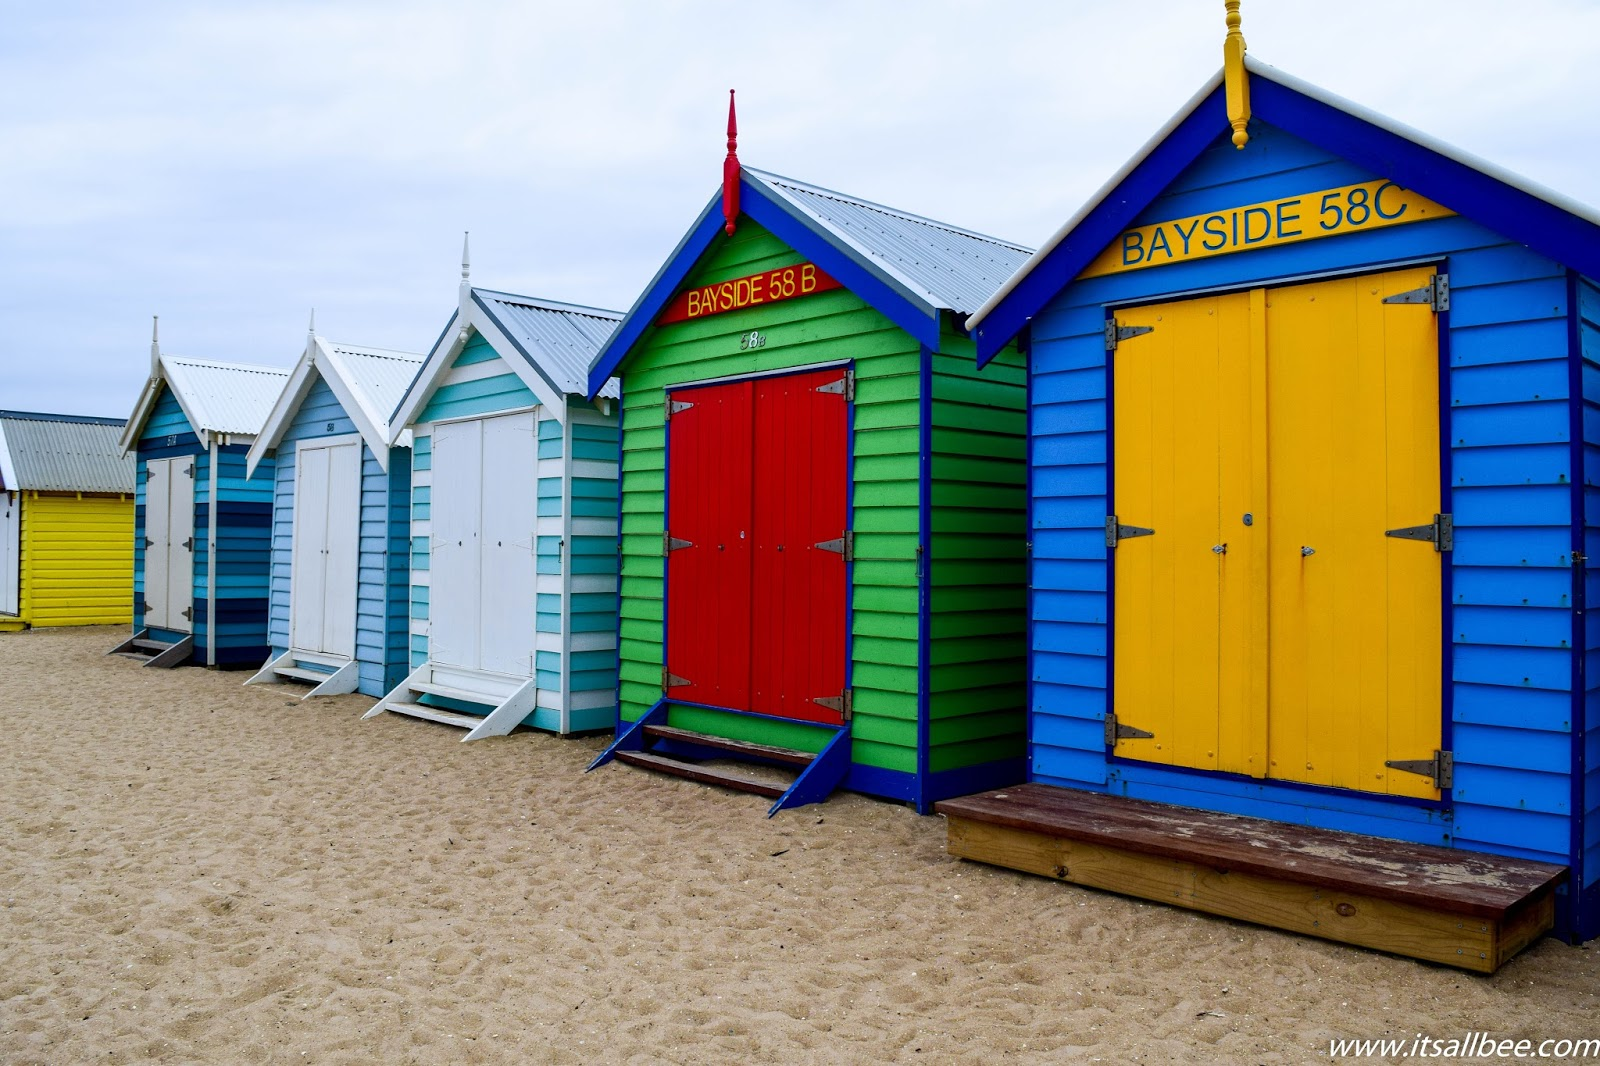 How To Get To Brighton Beach Melbourne's Bathing Boxes Beach By Train #itsallbee #australia #traveltips #beaches #ocean #vacation #takemethere #beachlife